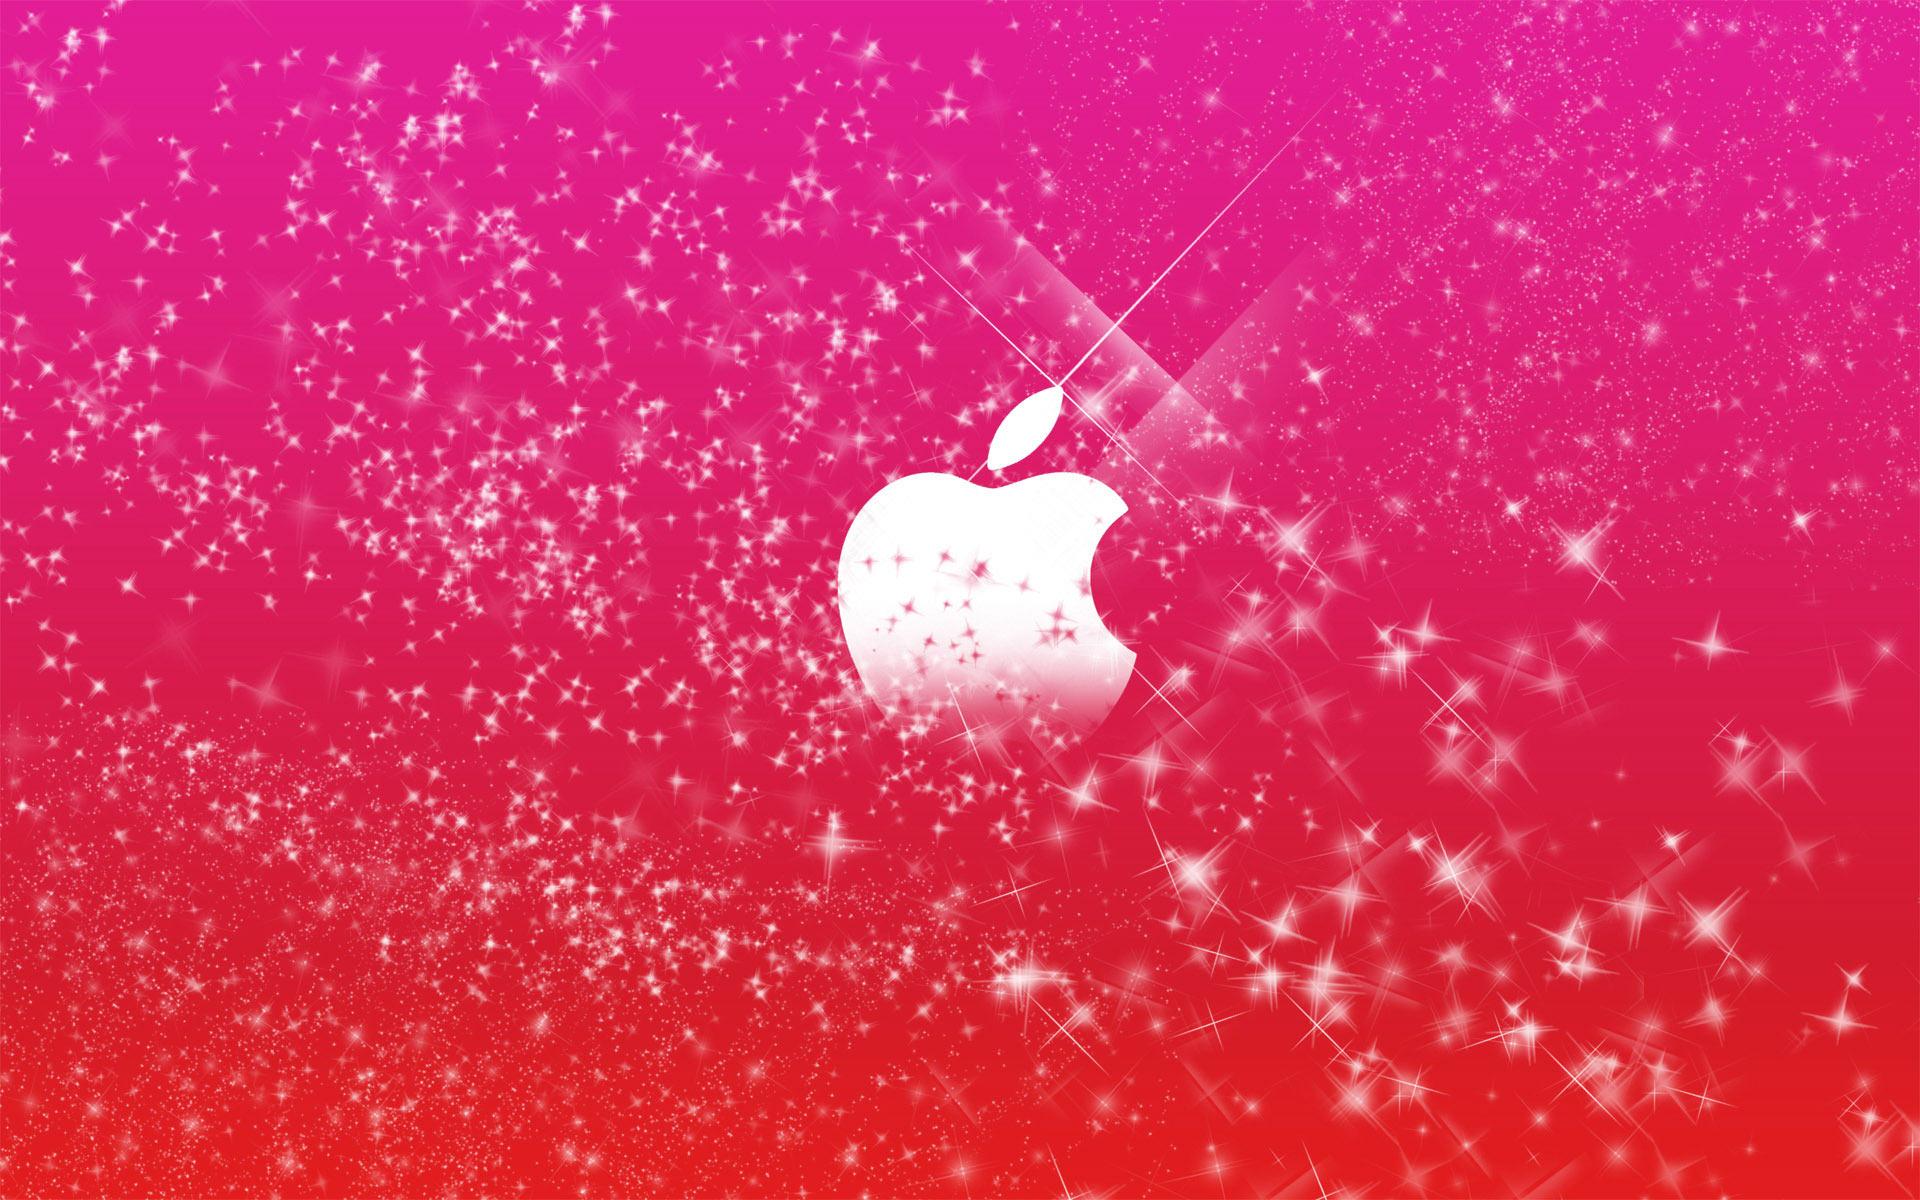 pink desktop backgrounds pink desktop backgrounds Desktop 1920x1200